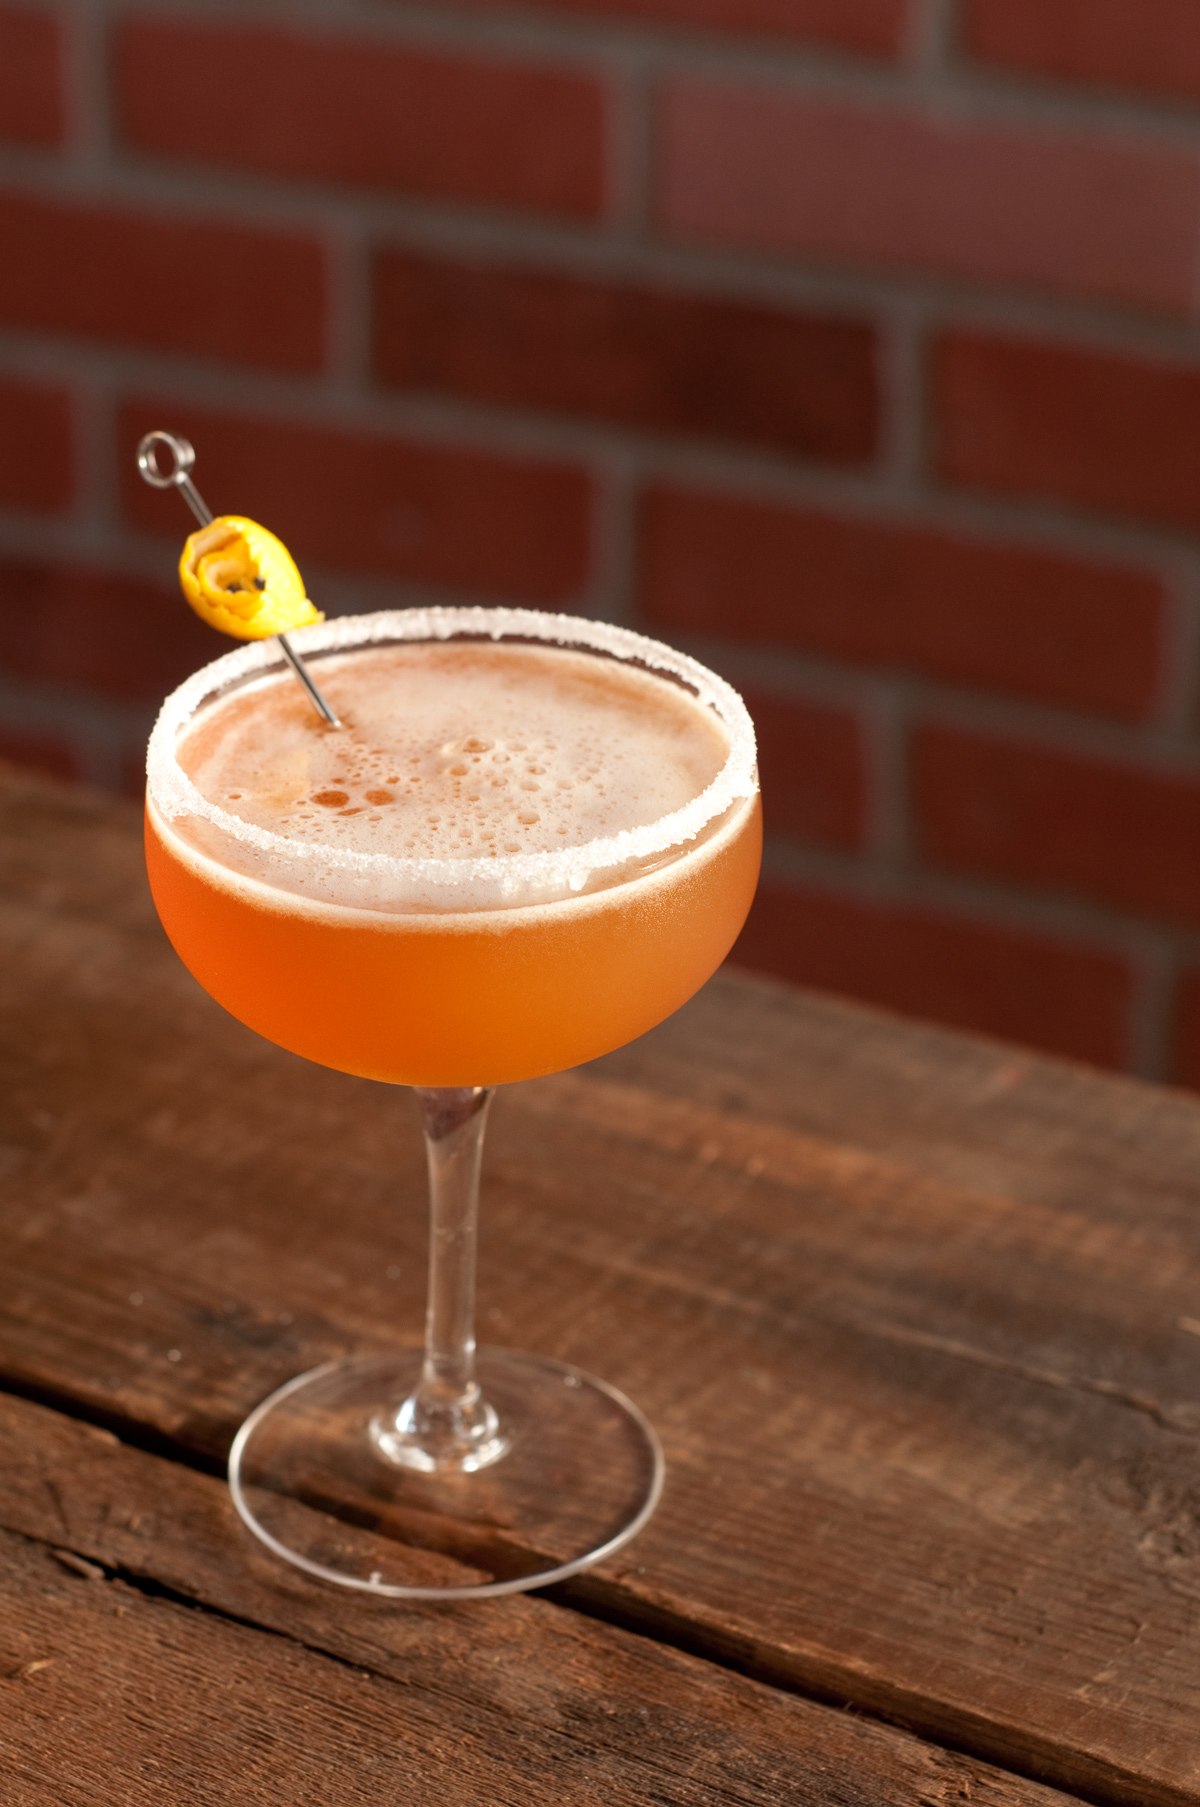 Sour cocktail recipe